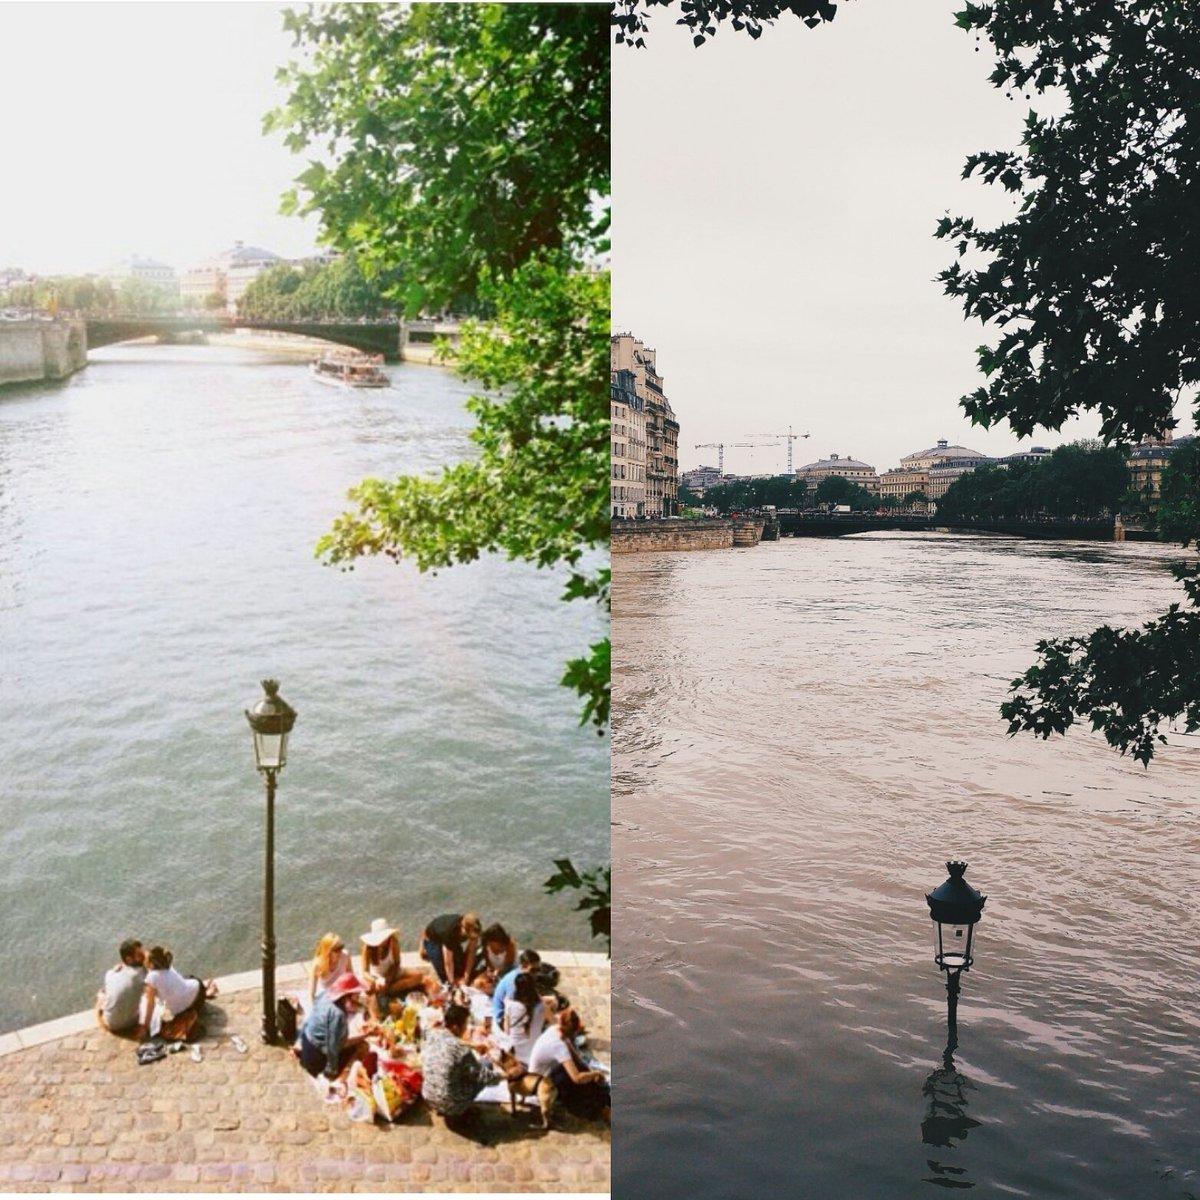 Un avant-après impressionnant de la Seine  #CrueParis  #CrueSeine https://t.co/Dbaq1a7S6O